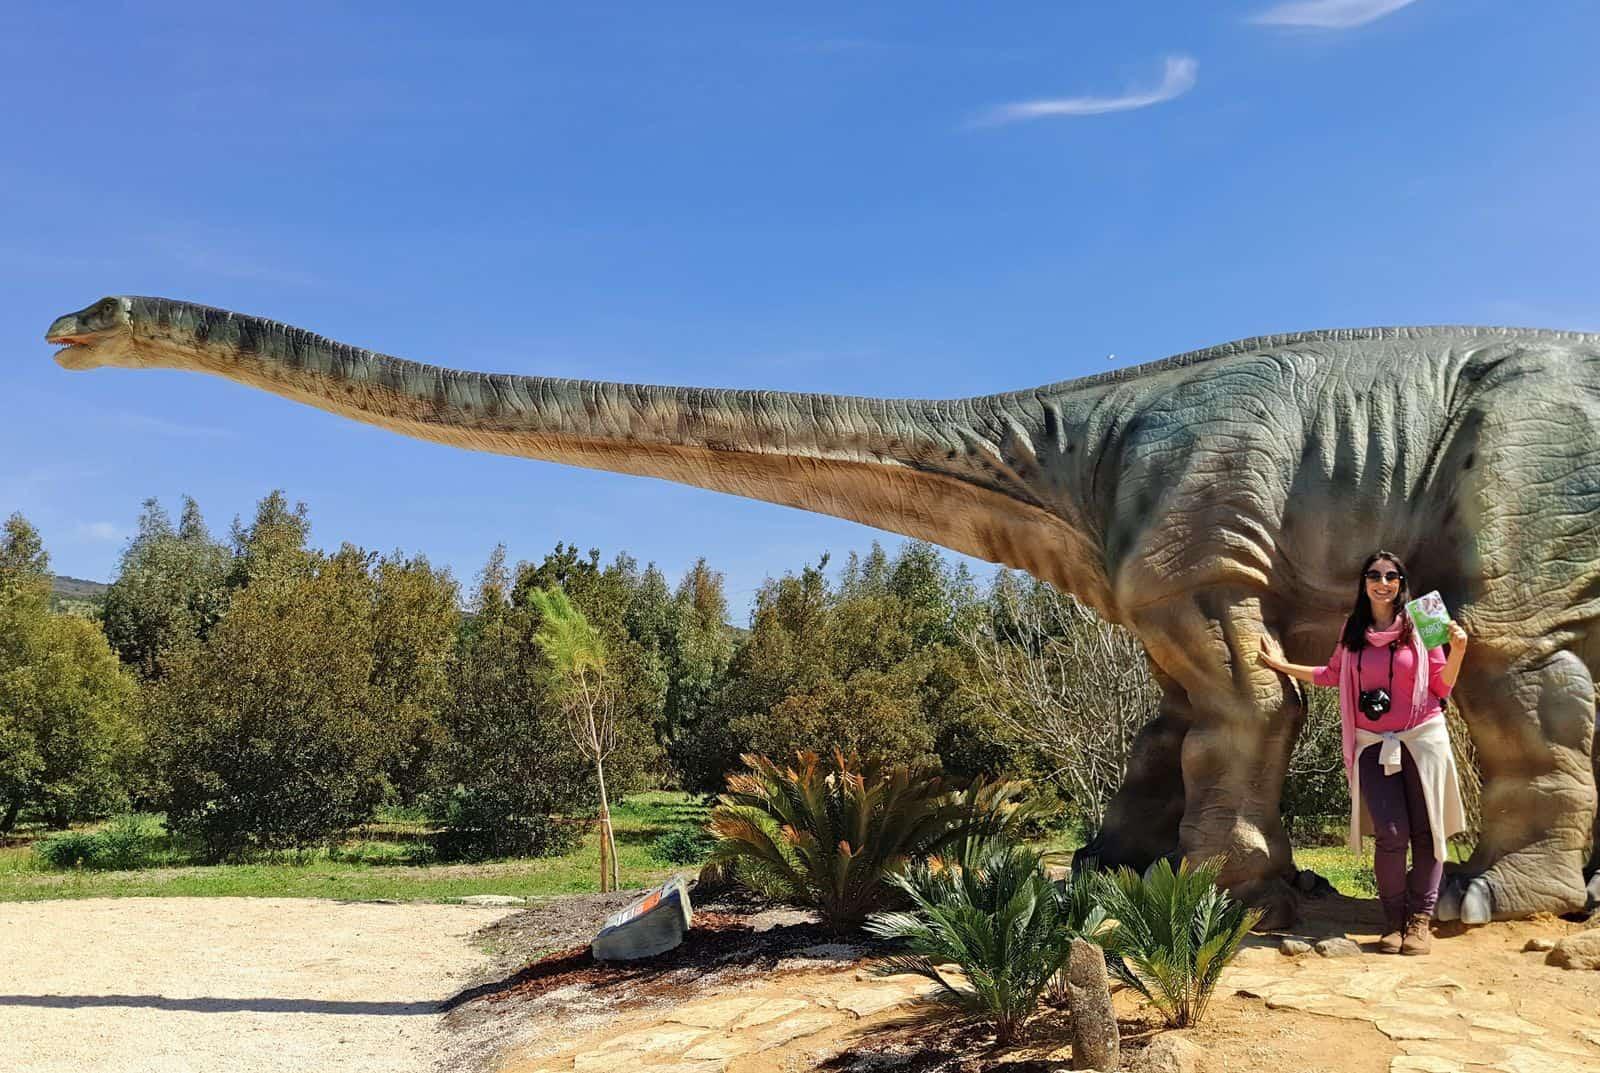 parco_sardegna_miniatura_tuili_dinosauri